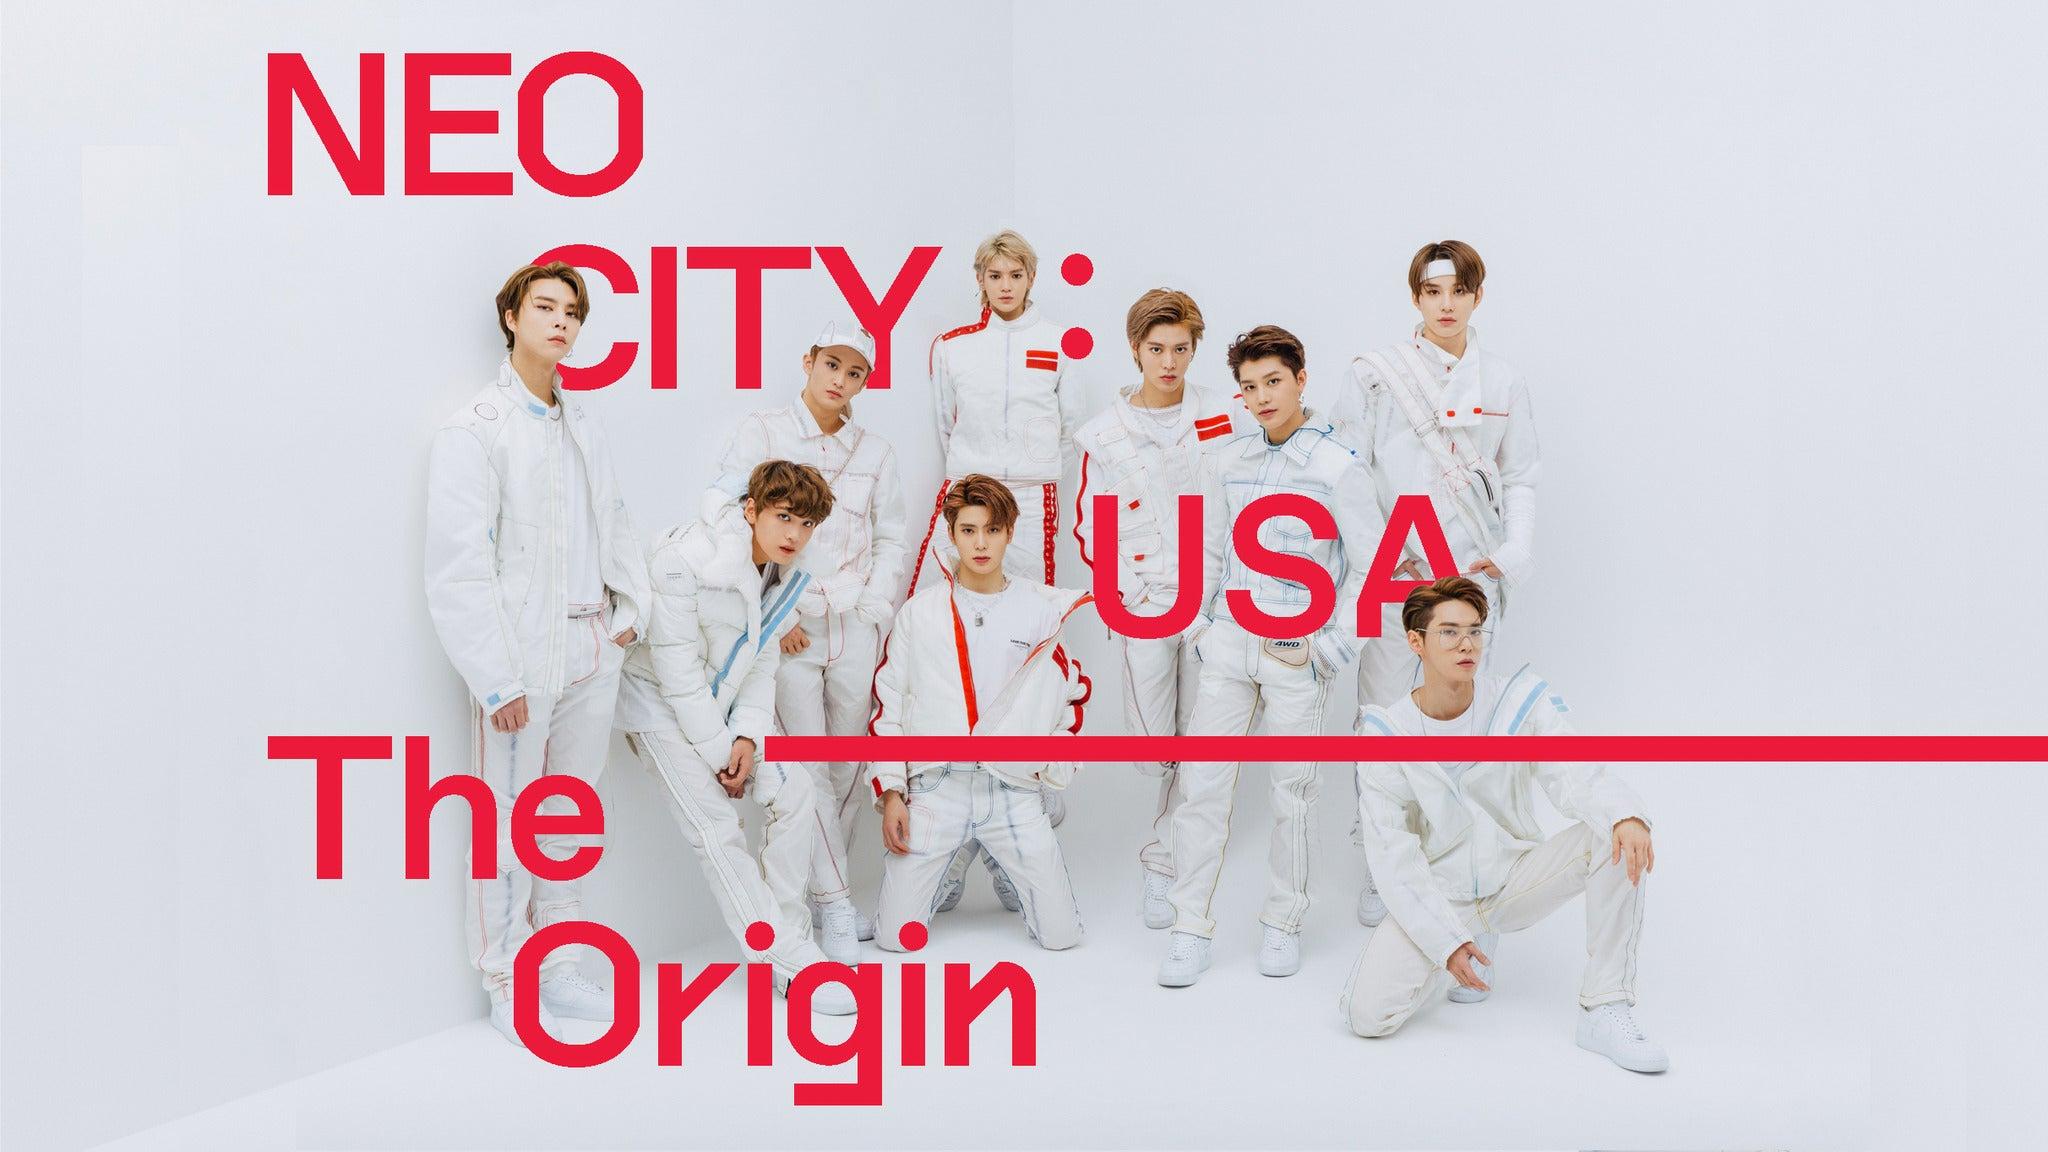 NCT 127 WORLD TOUR NEO CITY: ATLANTA - The Origin